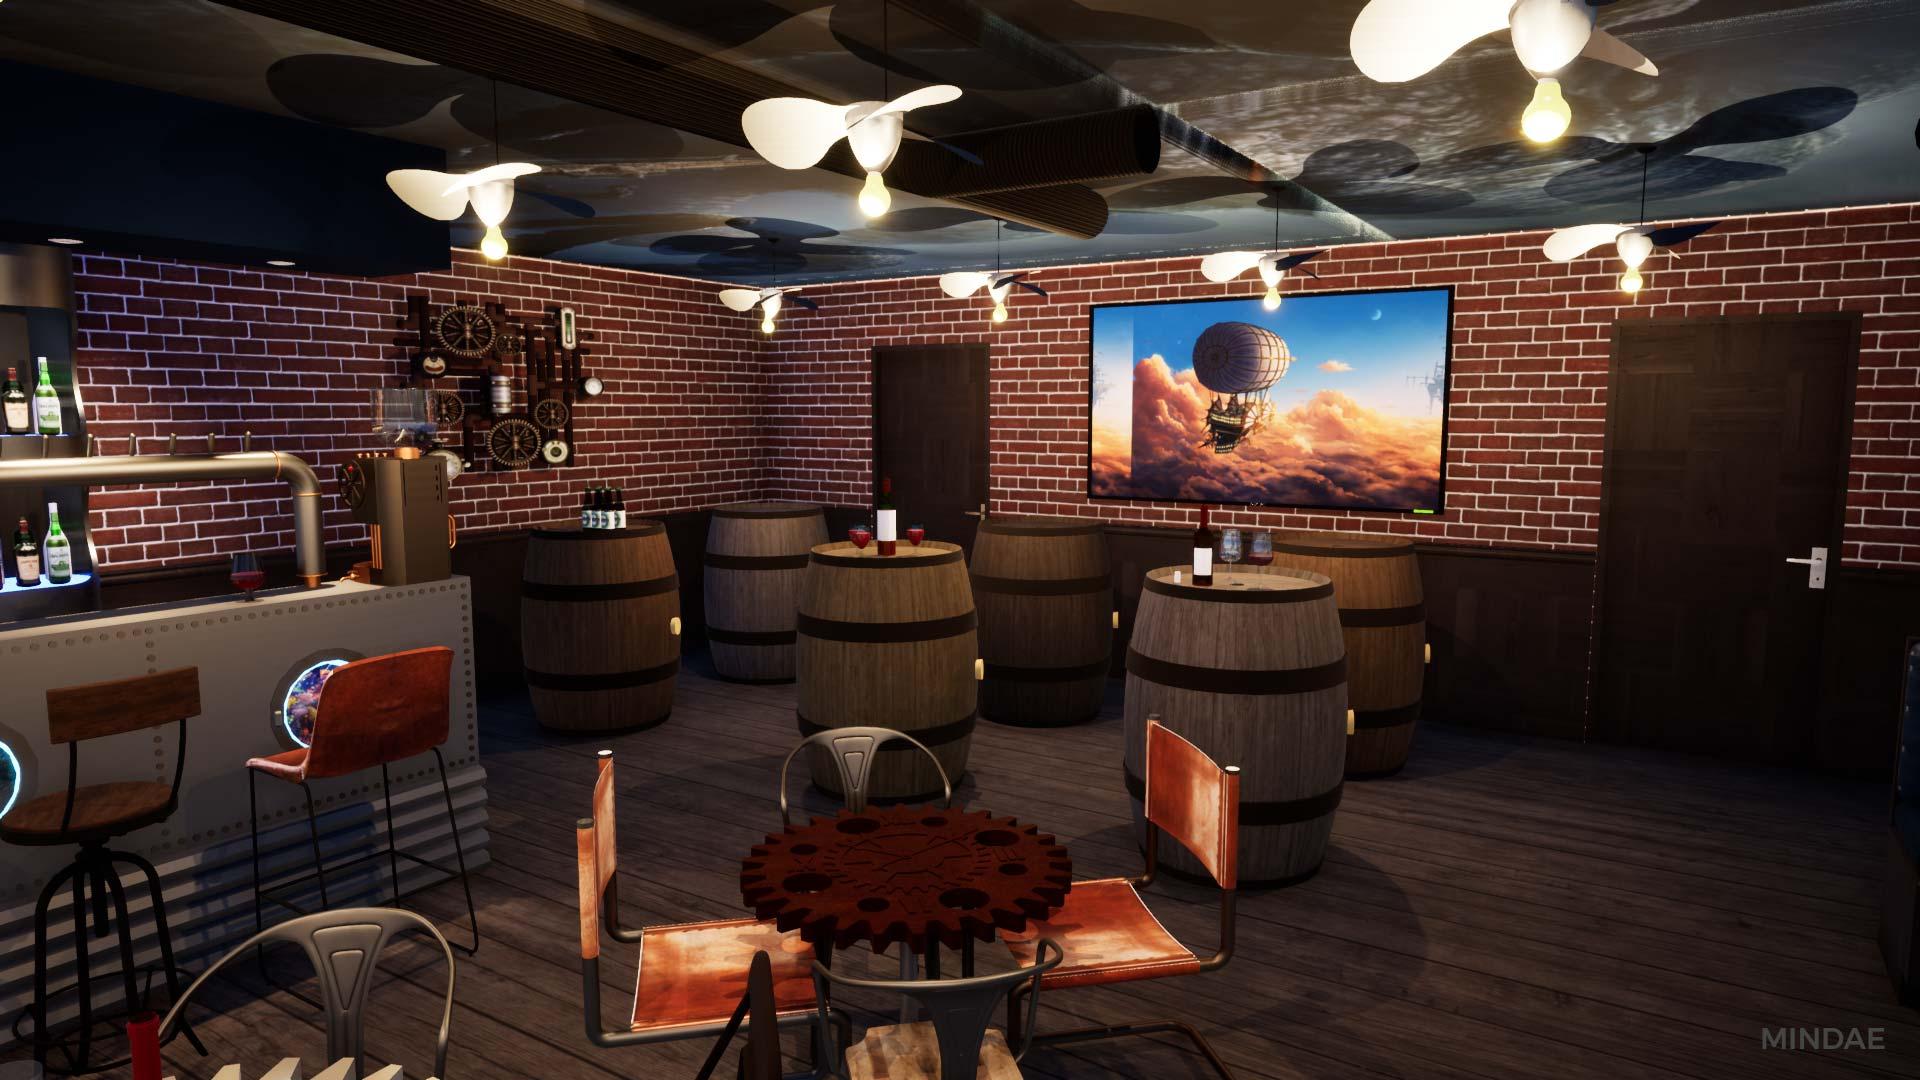 Mindae_3D_machiniste_bar_caen_steampunk_meca_agencement_comptoir_banquettes-(4)